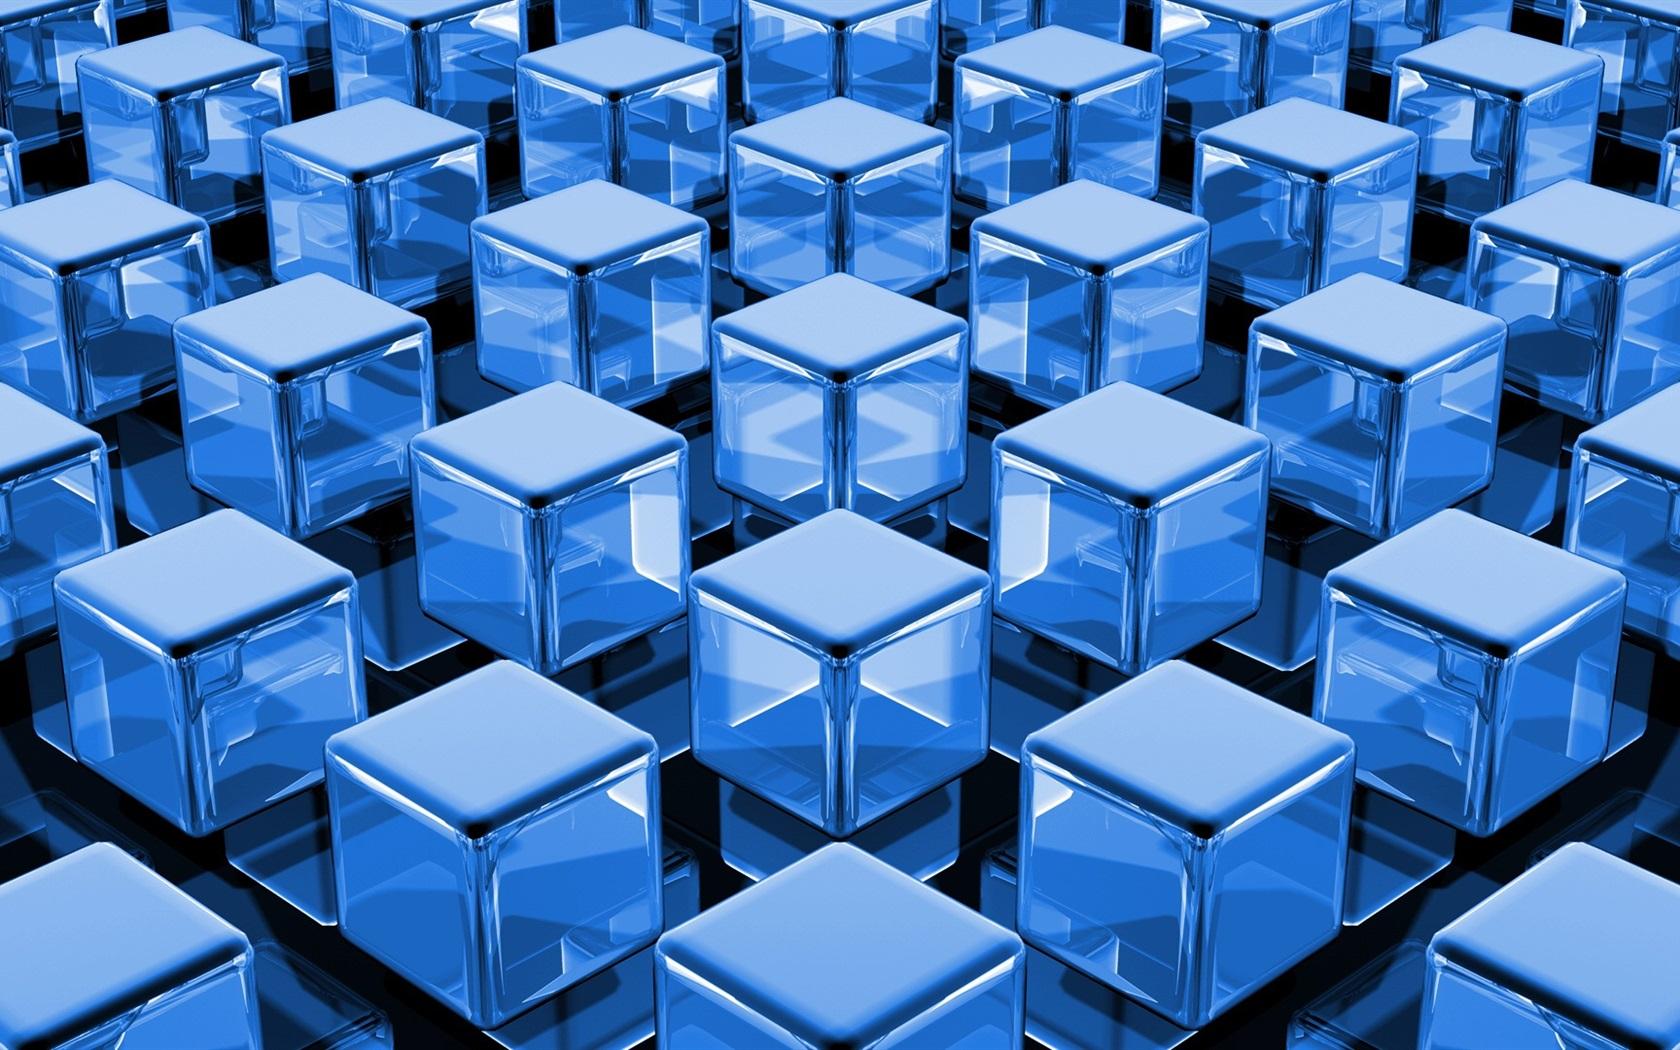 3d Wallpaper Hd 1680x1050: Download Wallpaper 1680x1050 3D Blue Cubes HD Background